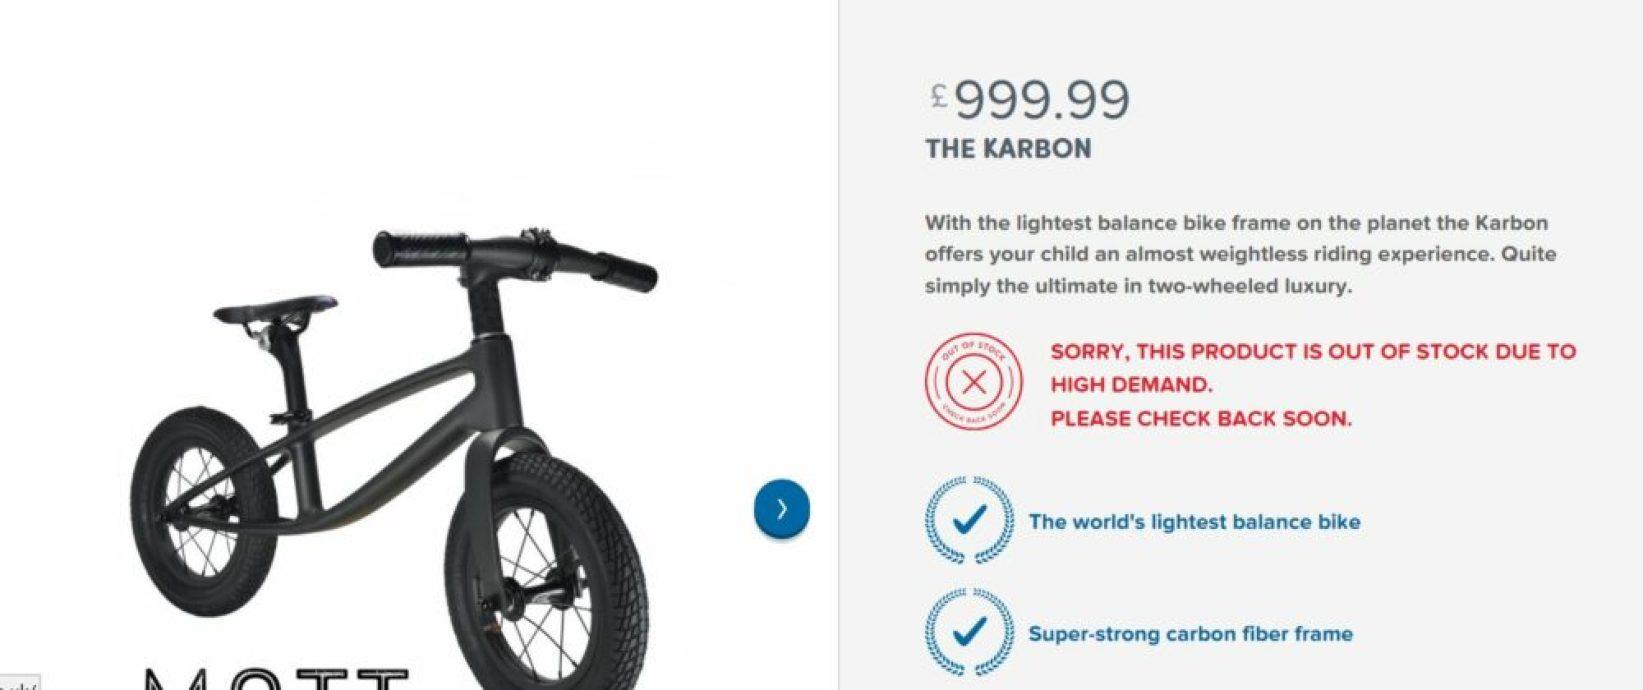 Kiddimoto Karbon new web page